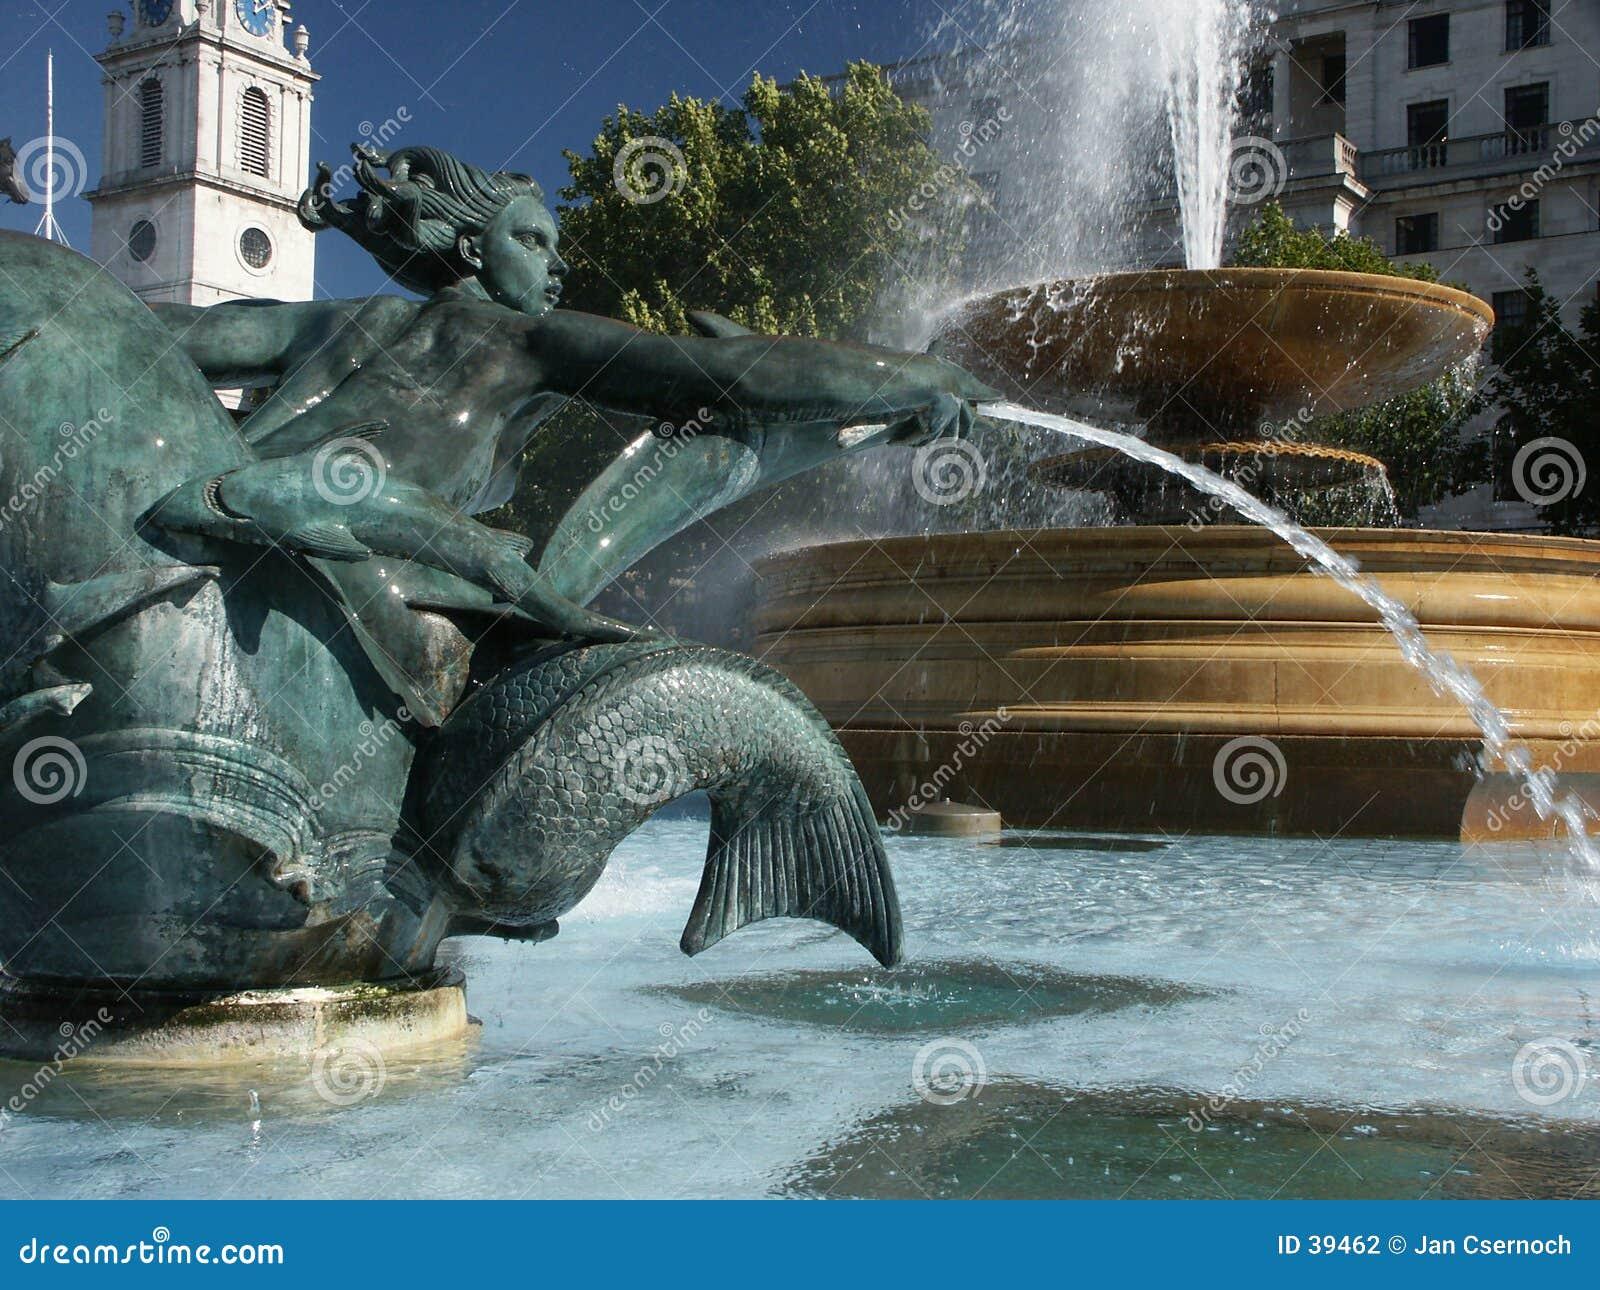 Trafalgar Square fountain close-up